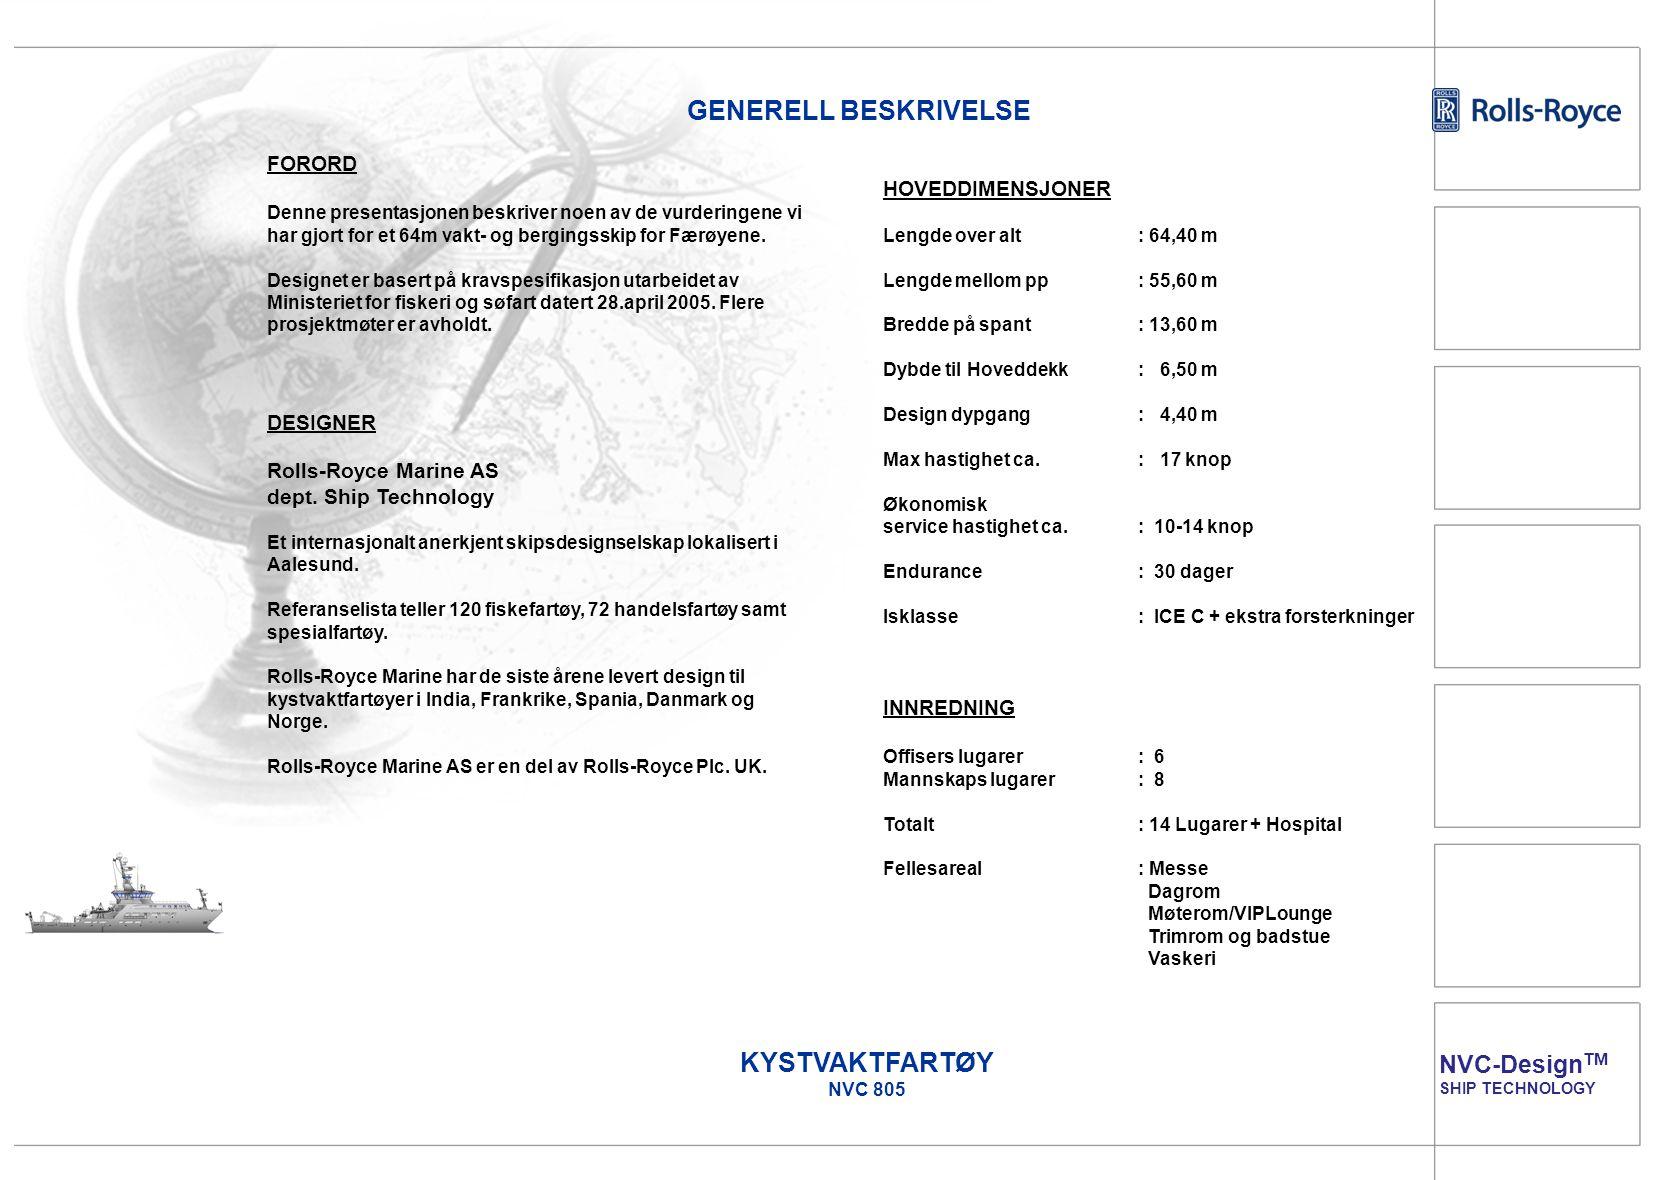 GENERELL BESKRIVELSE KYSTVAKTFARTØY NVC 805 NVC-DesignTM